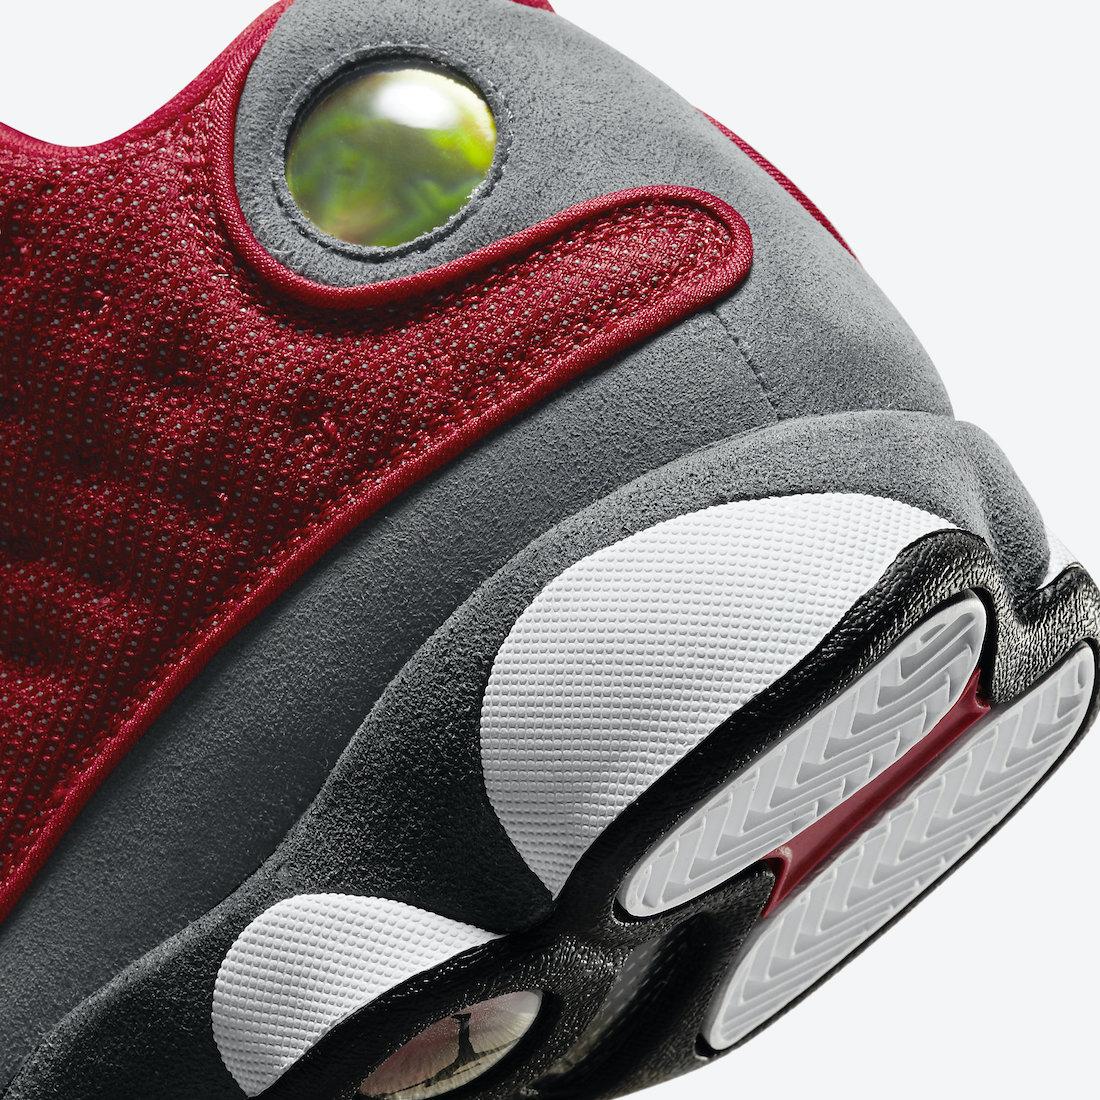 Air Jordan 13 Red Flint GS 884129-600 Release Date